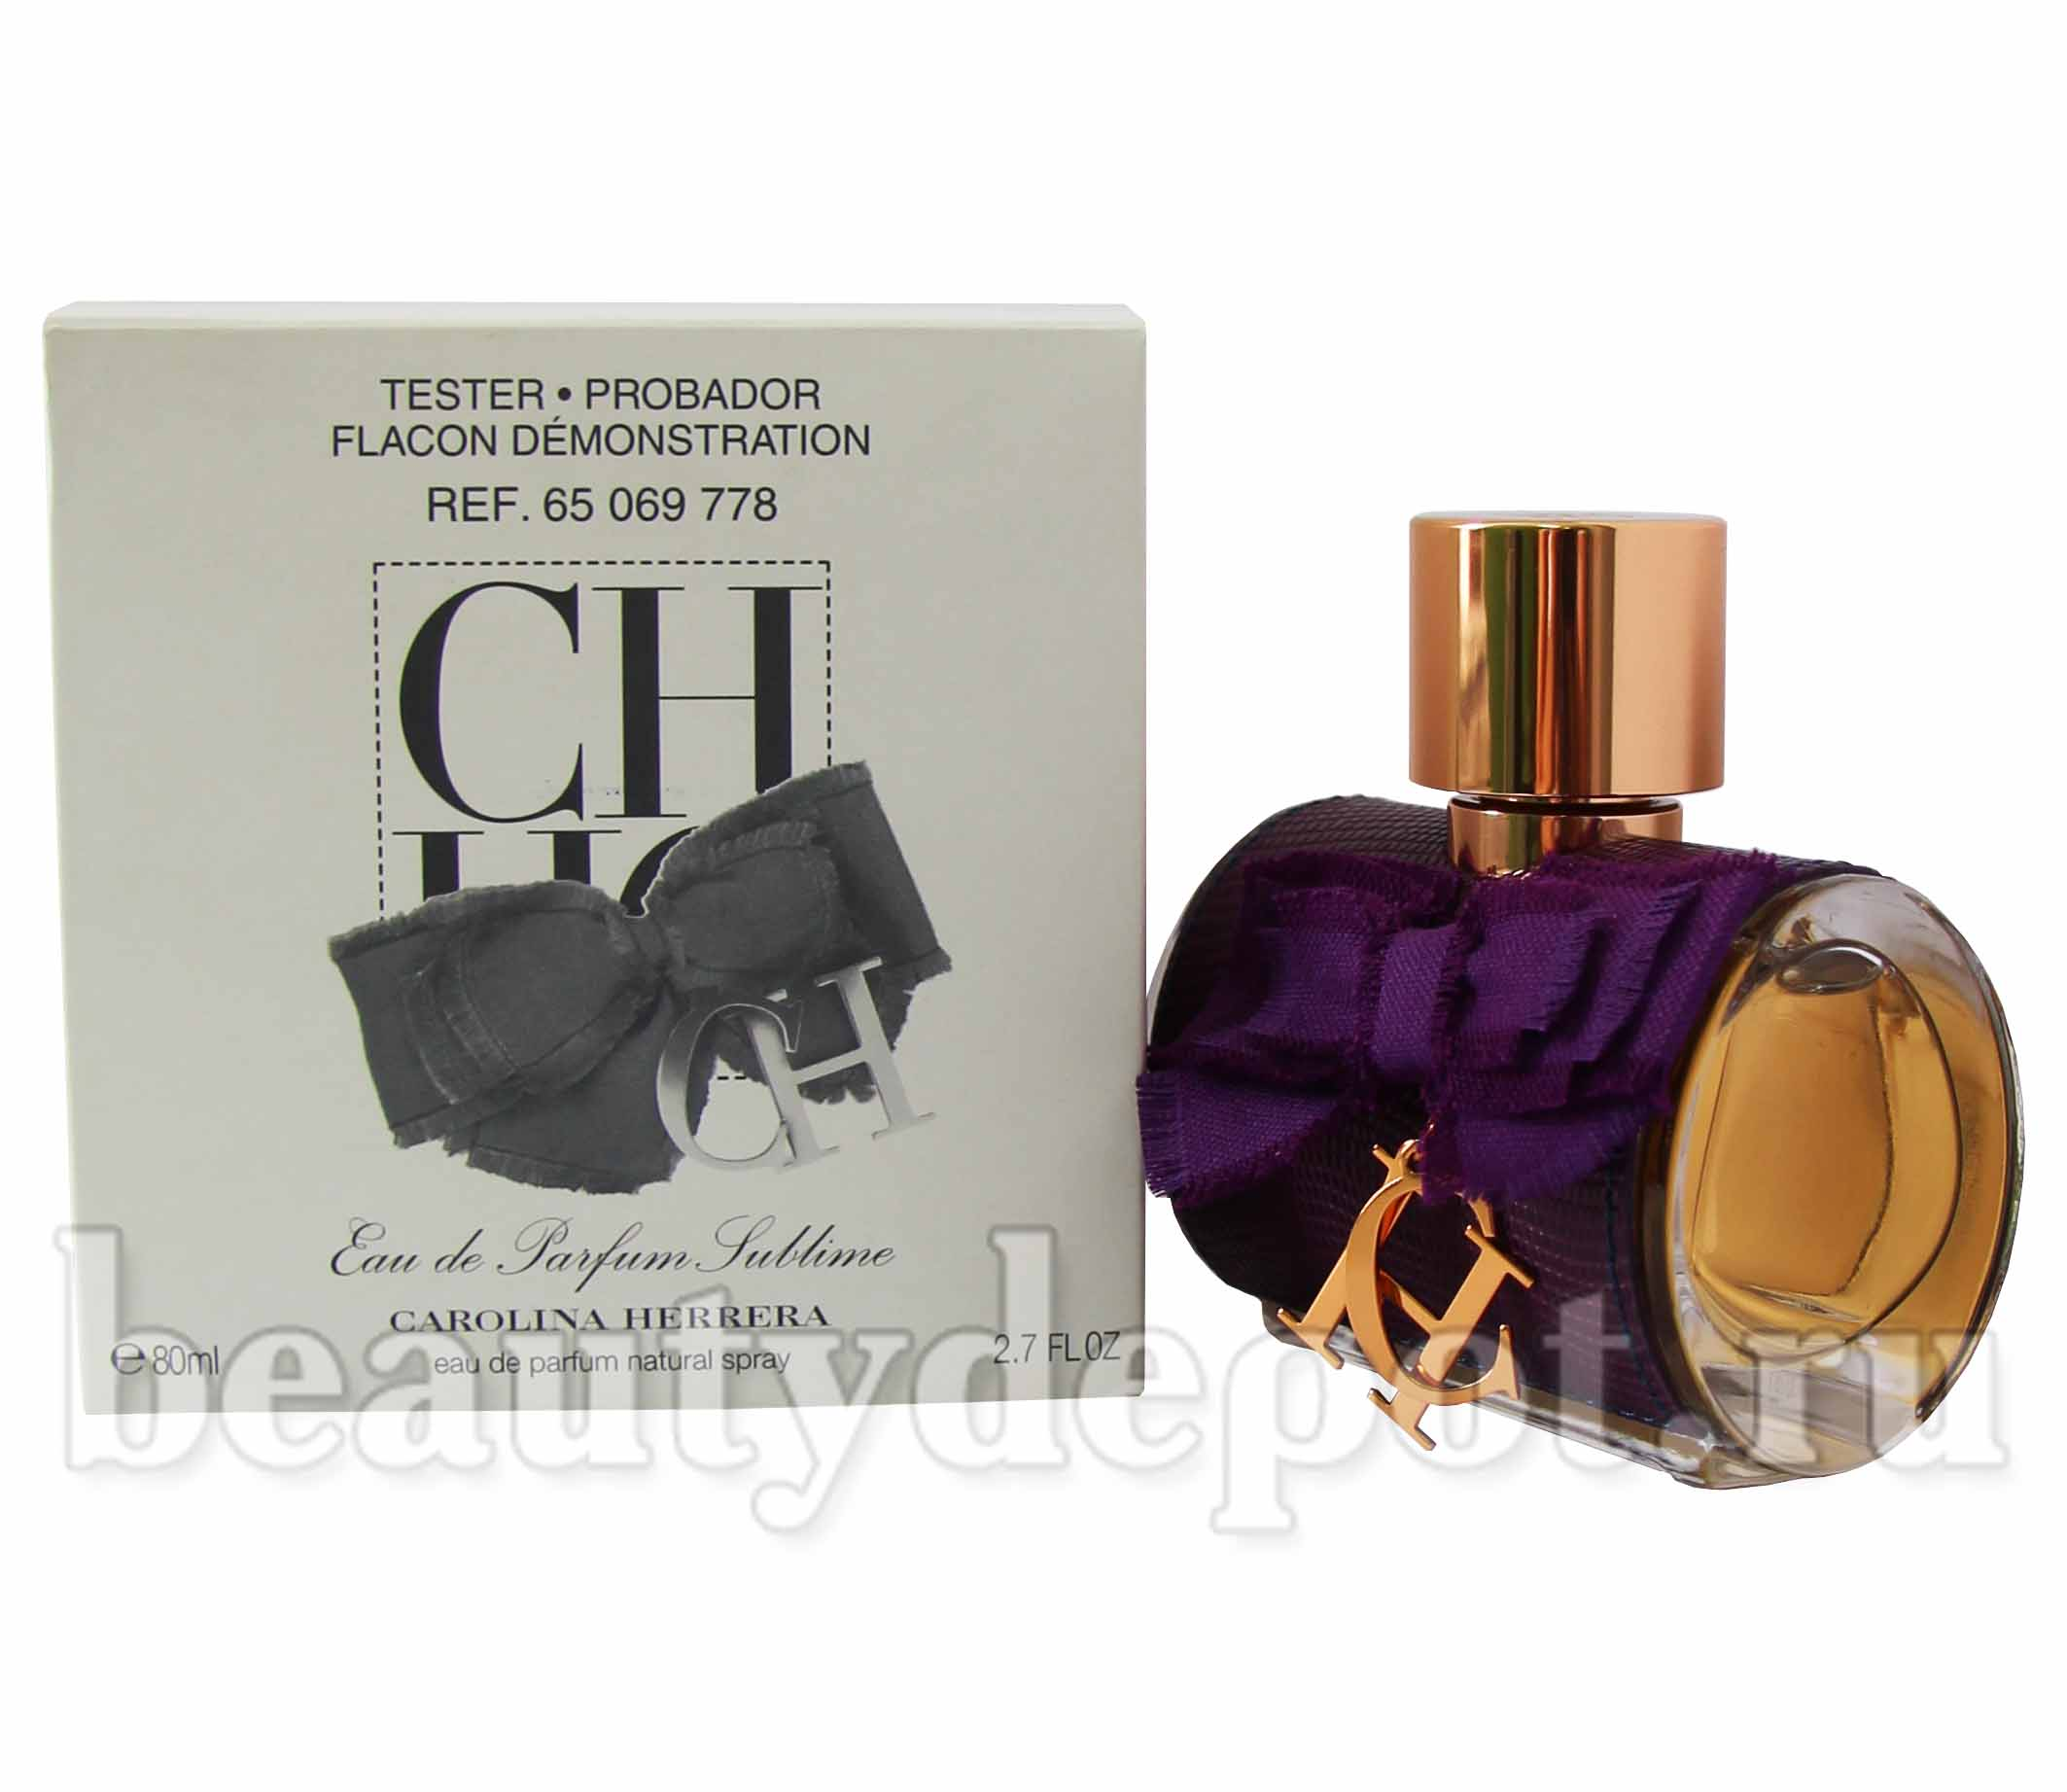 Ch Eau De Parfum Sublime Carolina Herrera For Women Edp 80ml 22250